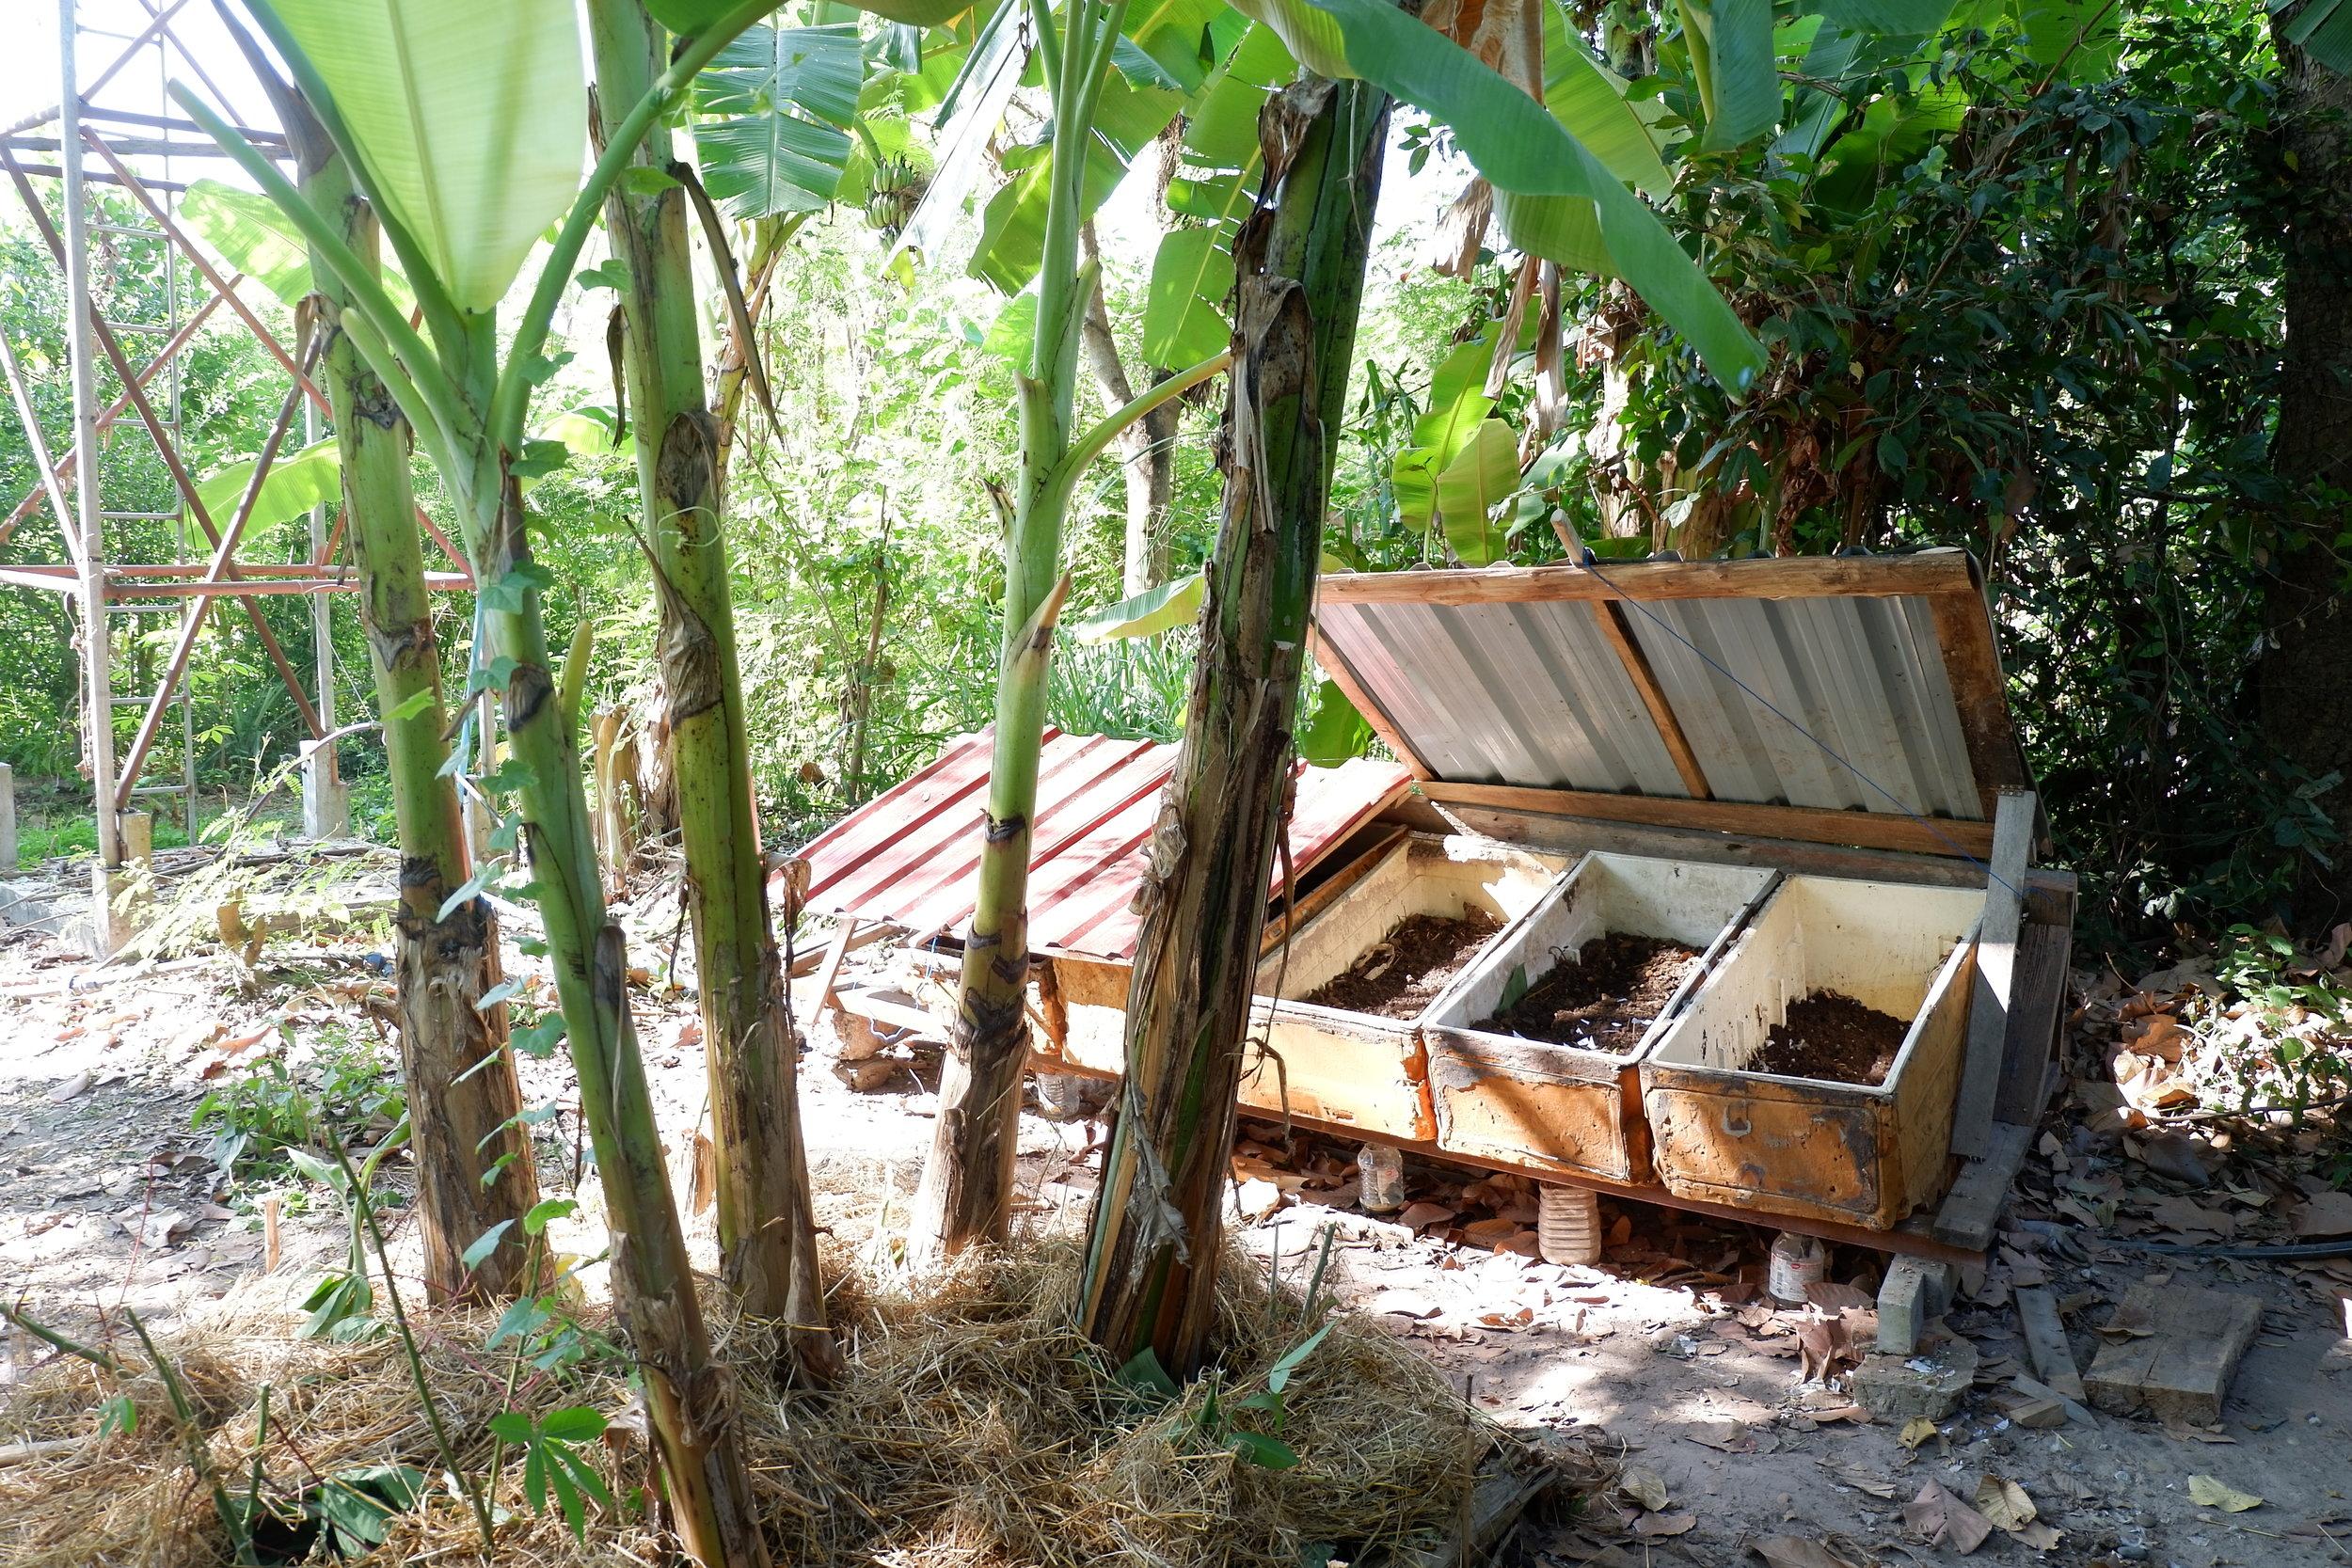 Gaia Ashram's community worm farm close to the kitchen.